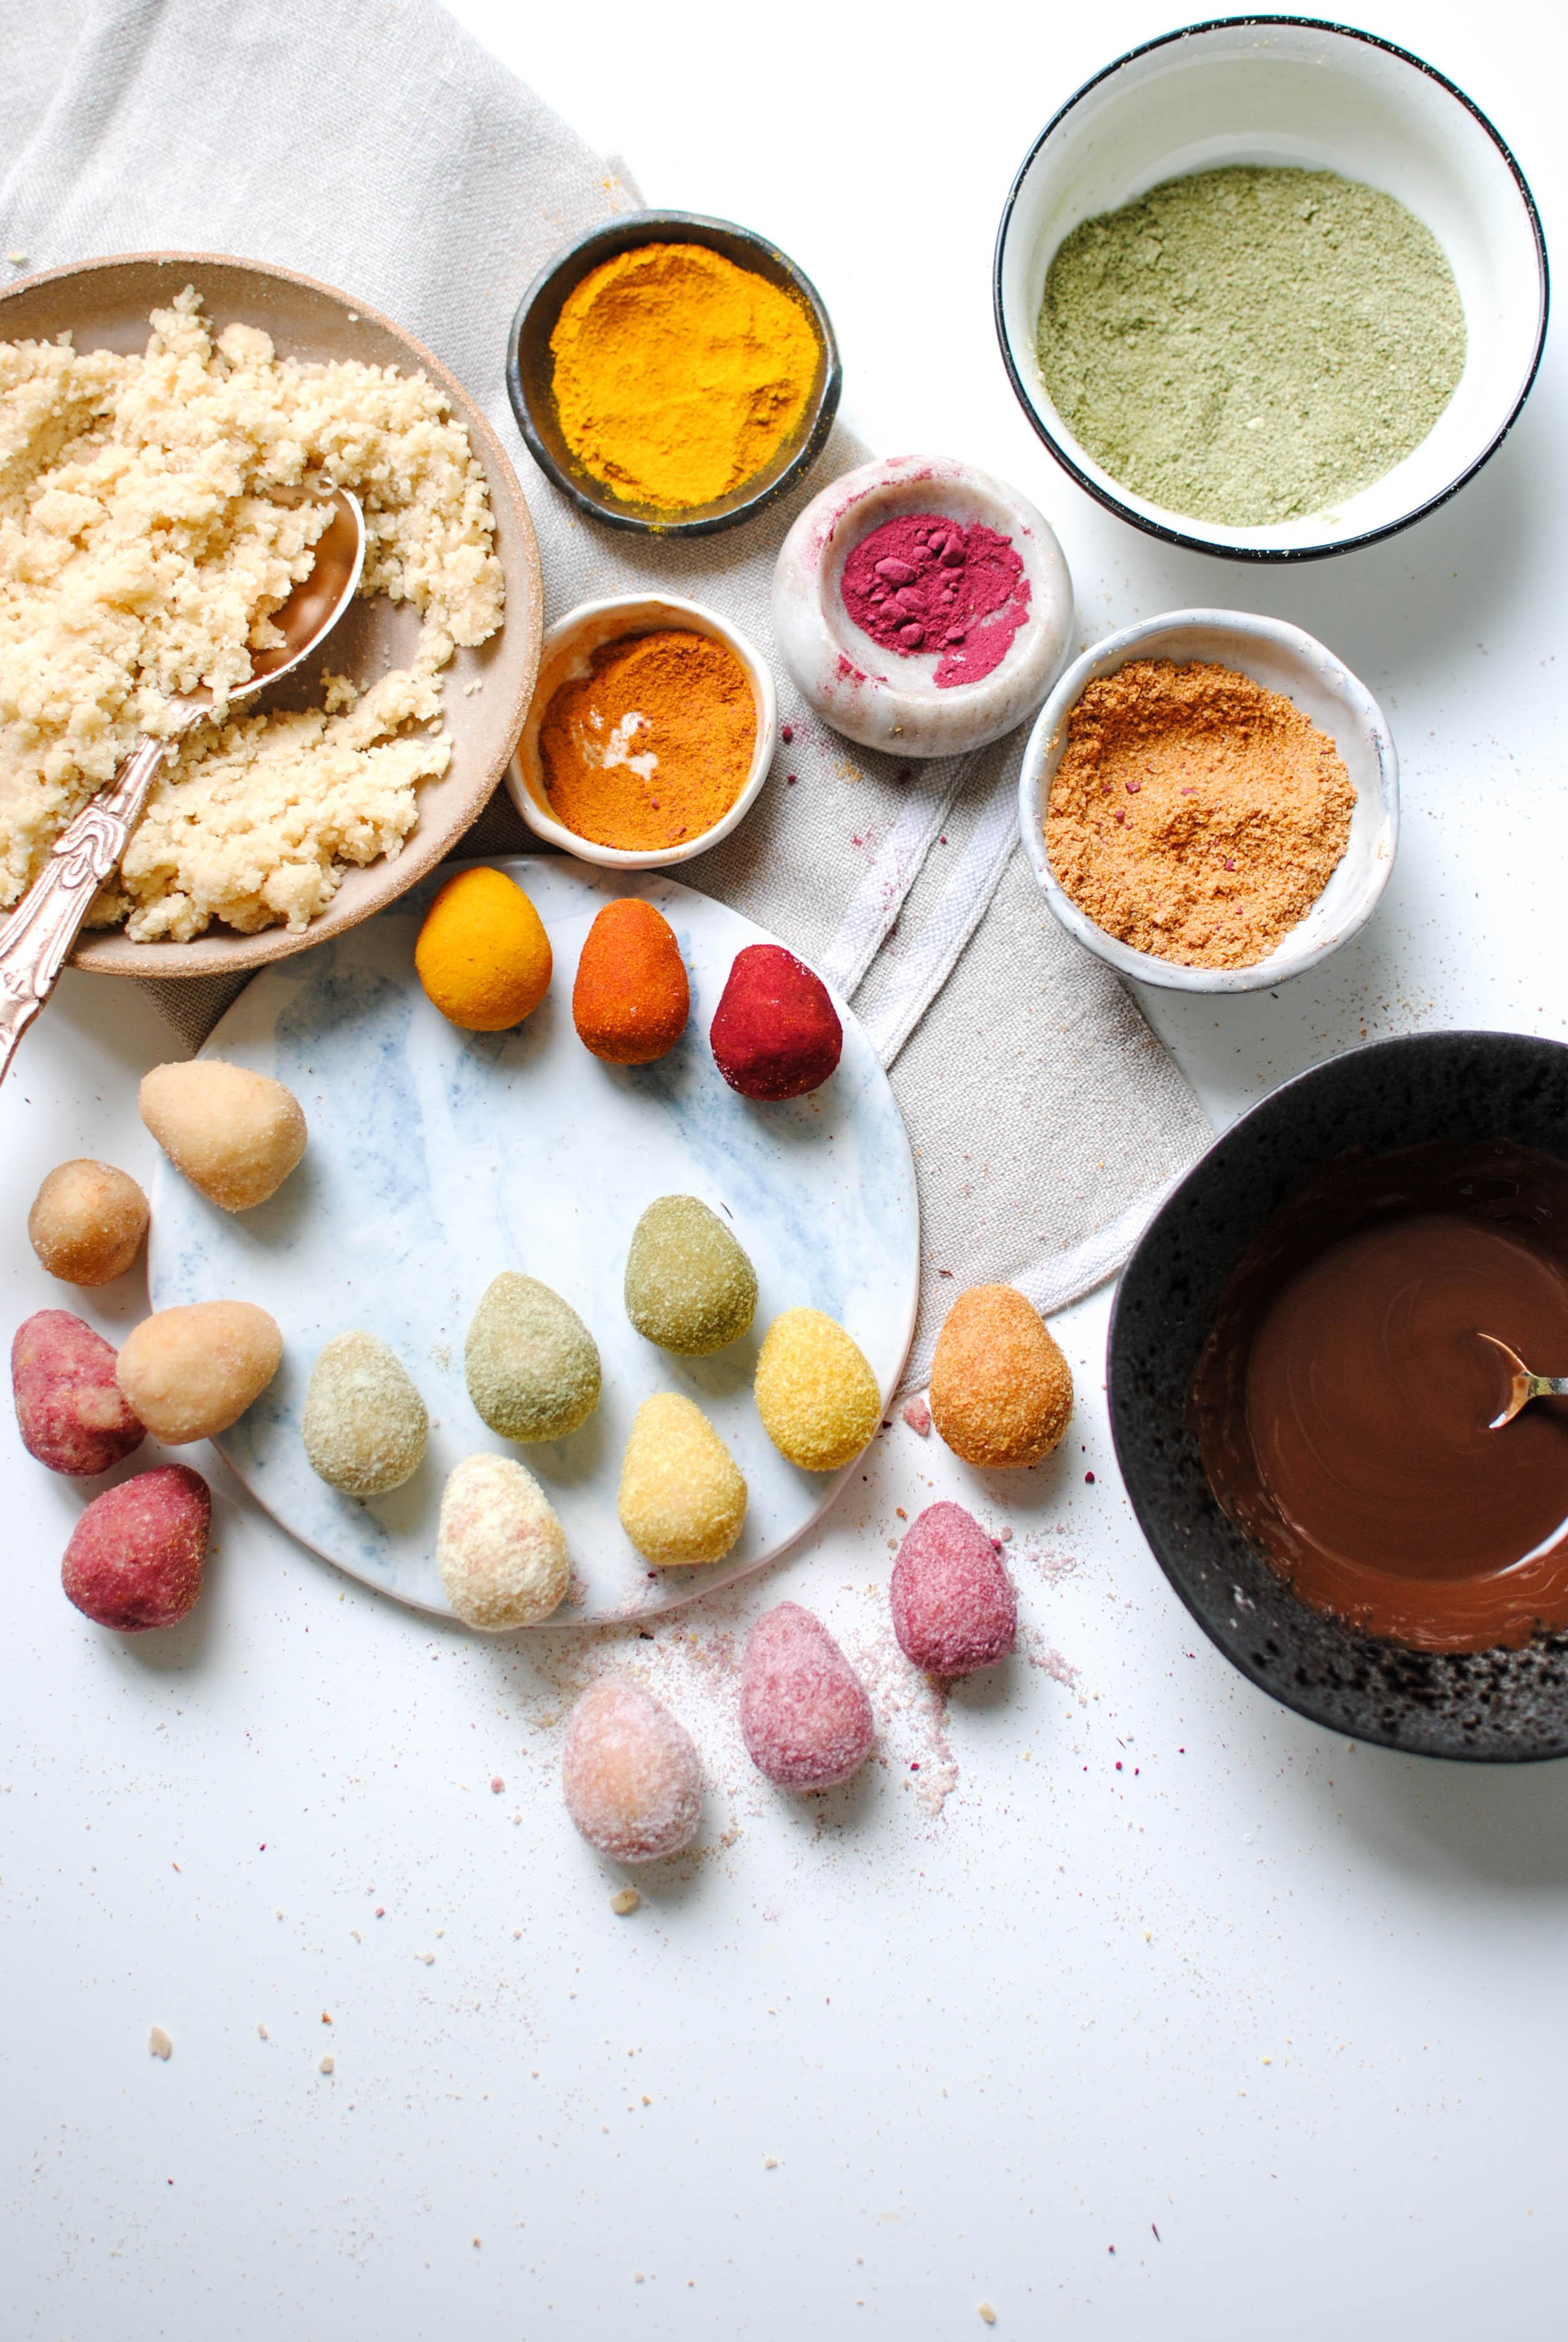 lemon coconut easter eggs | please consider | joana limao